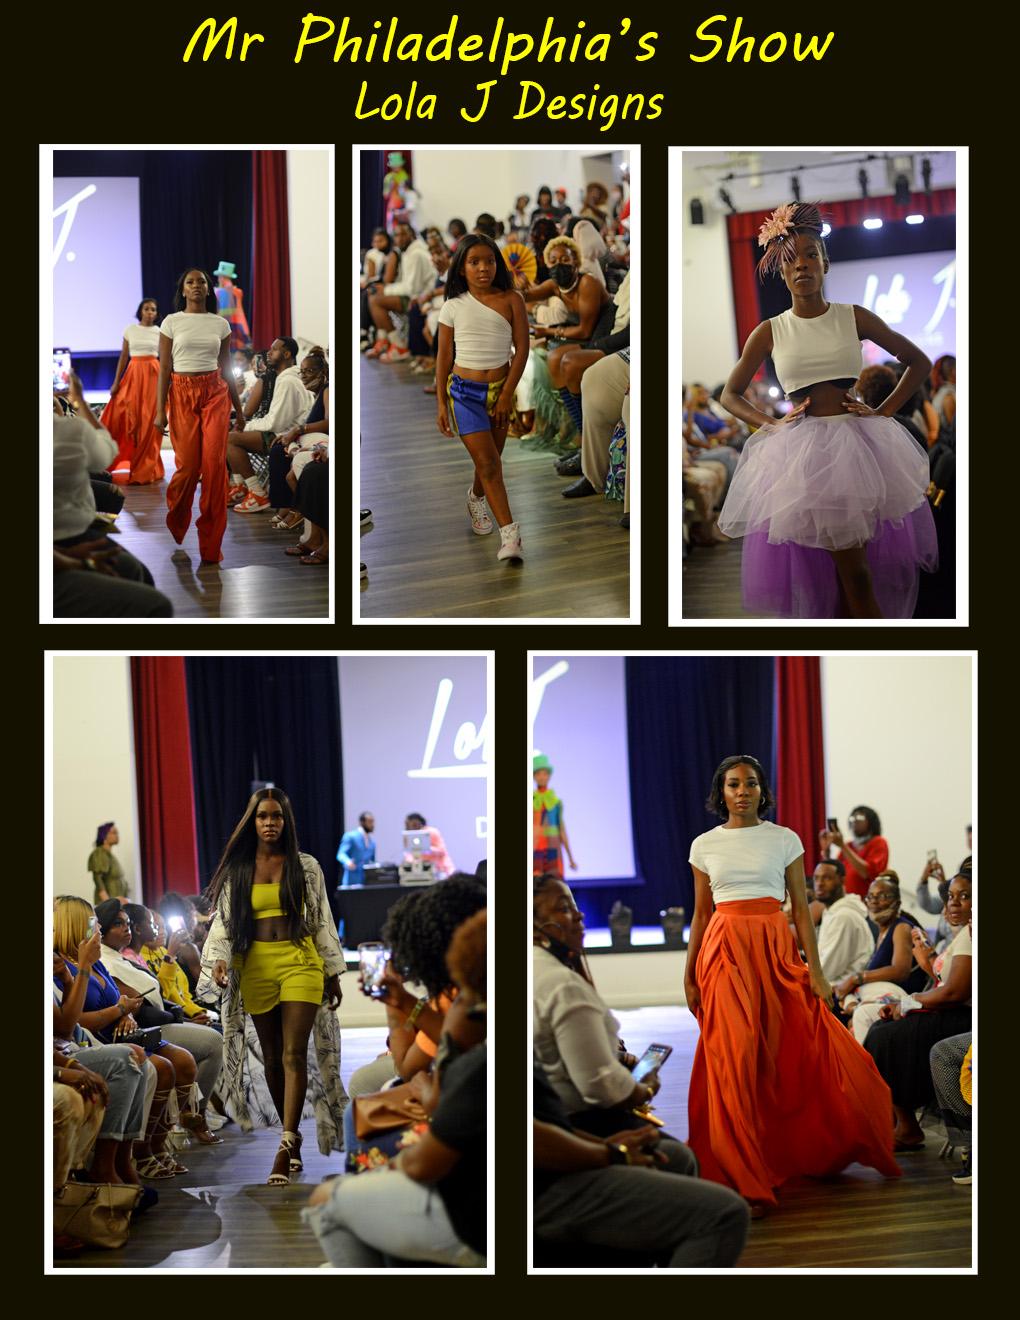 Lola J Designs